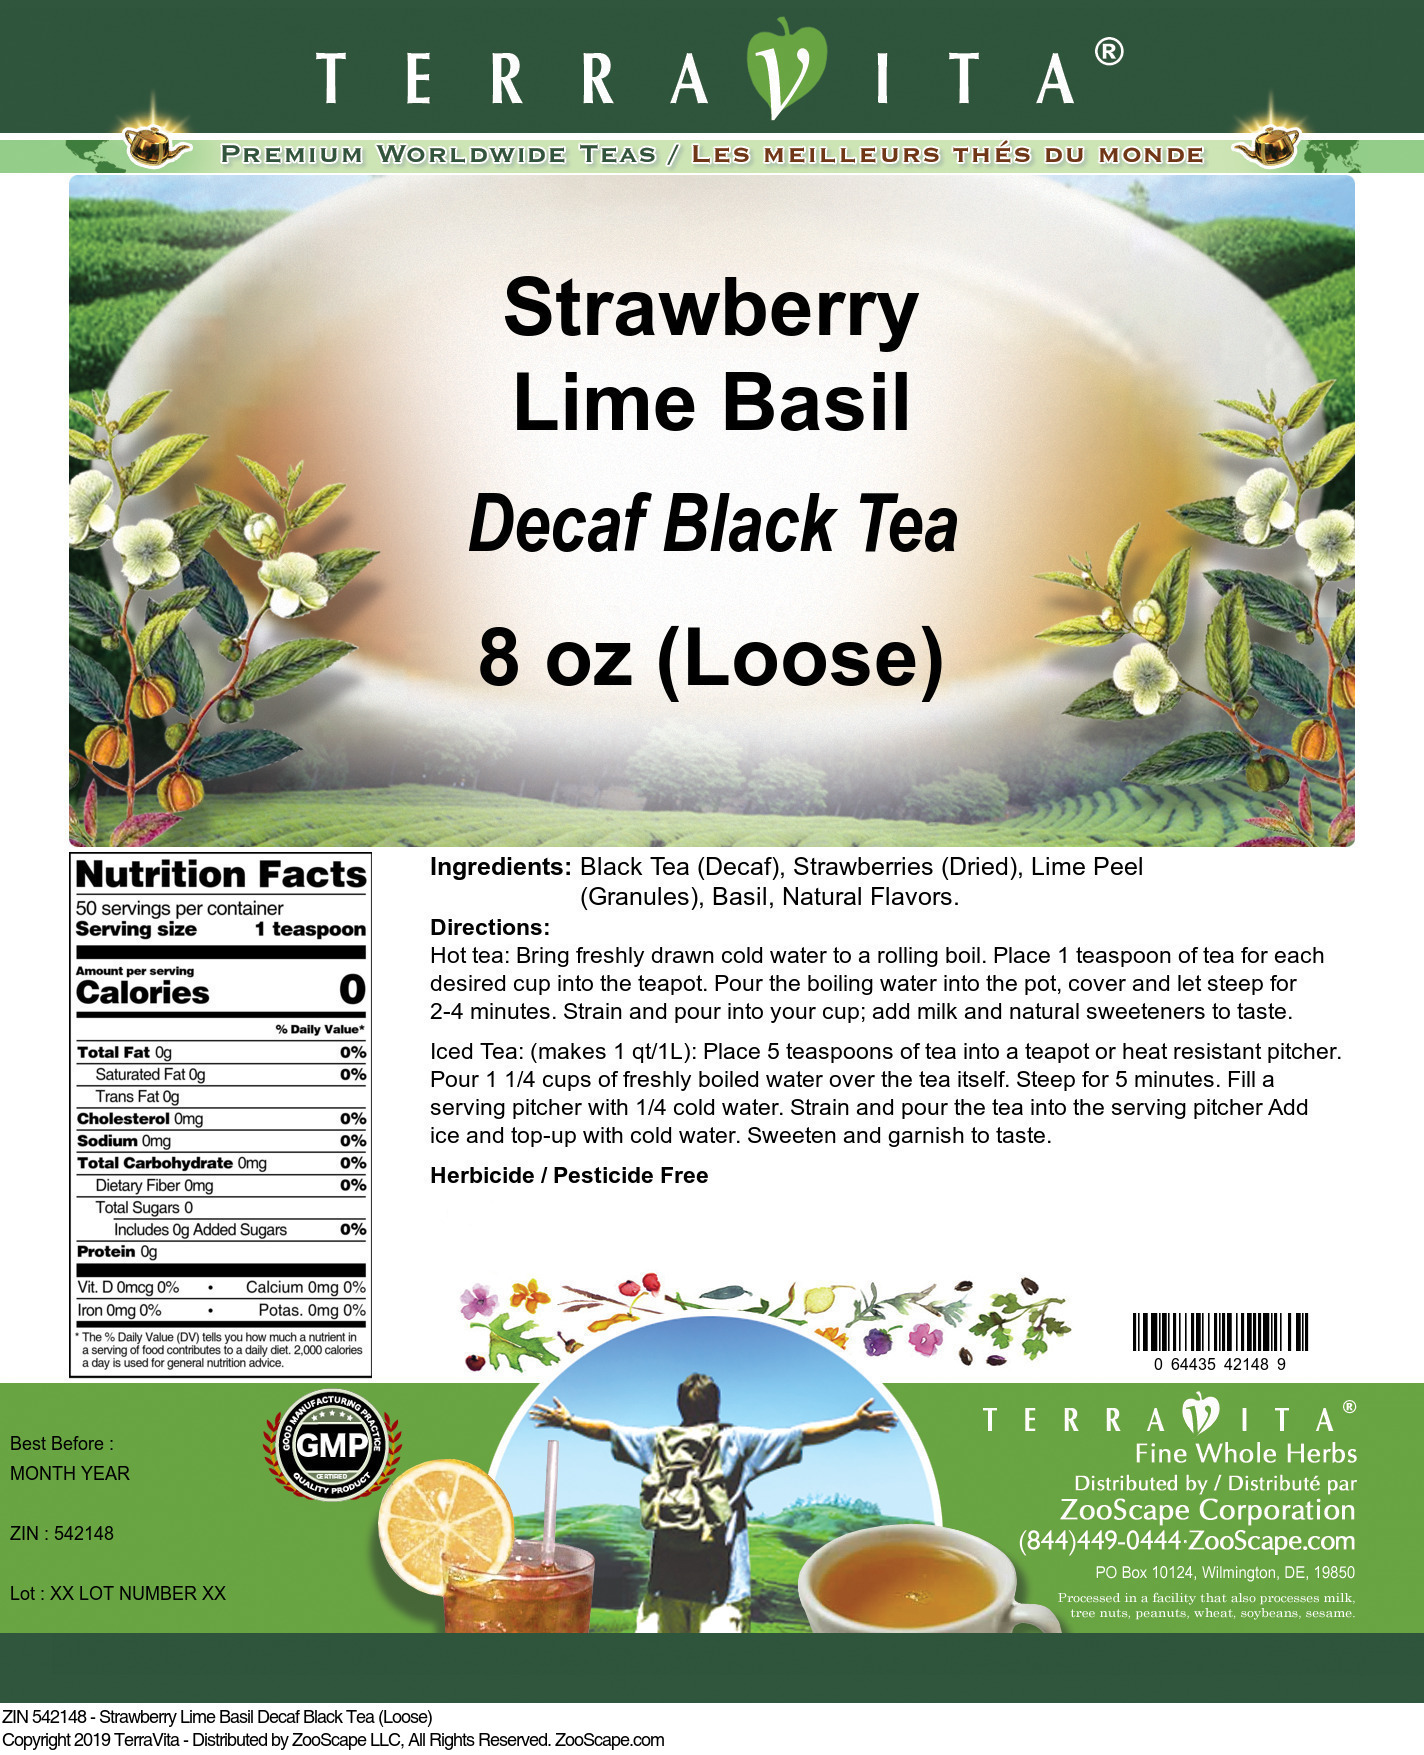 Strawberry Lime Basil Decaf Black Tea (Loose)